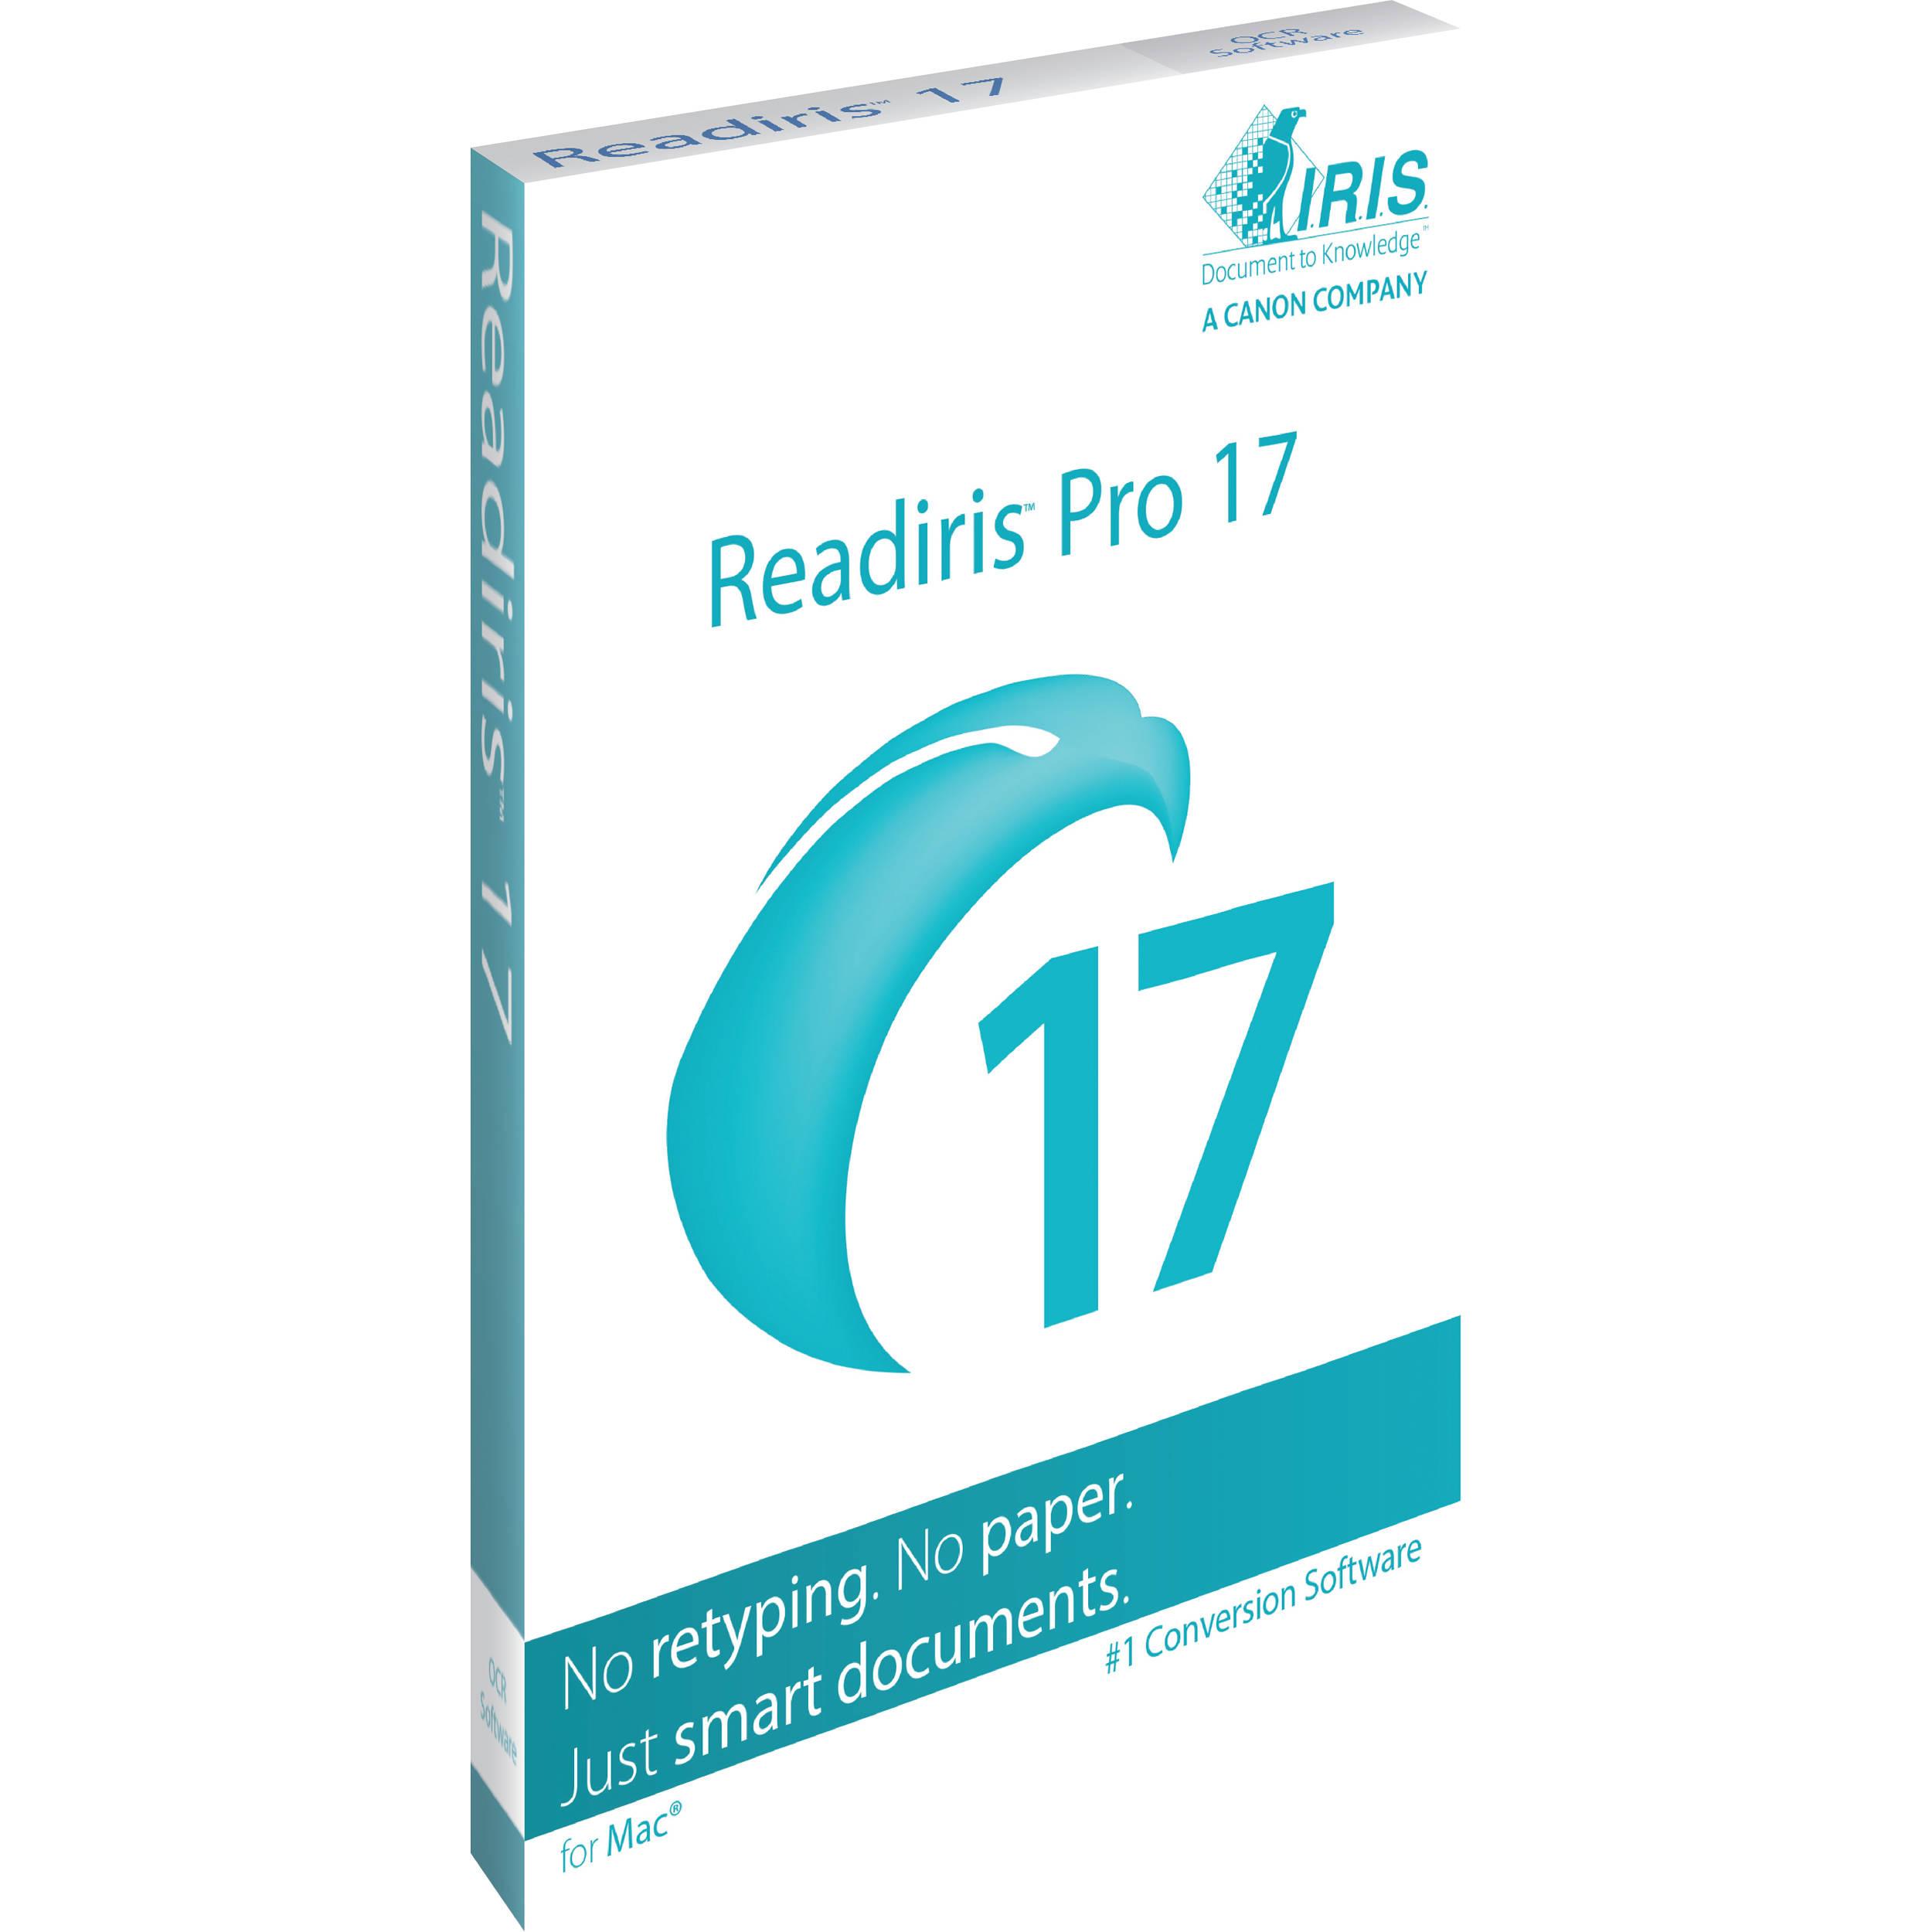 I.R.I.S. Readiris 12 Corporate buy key